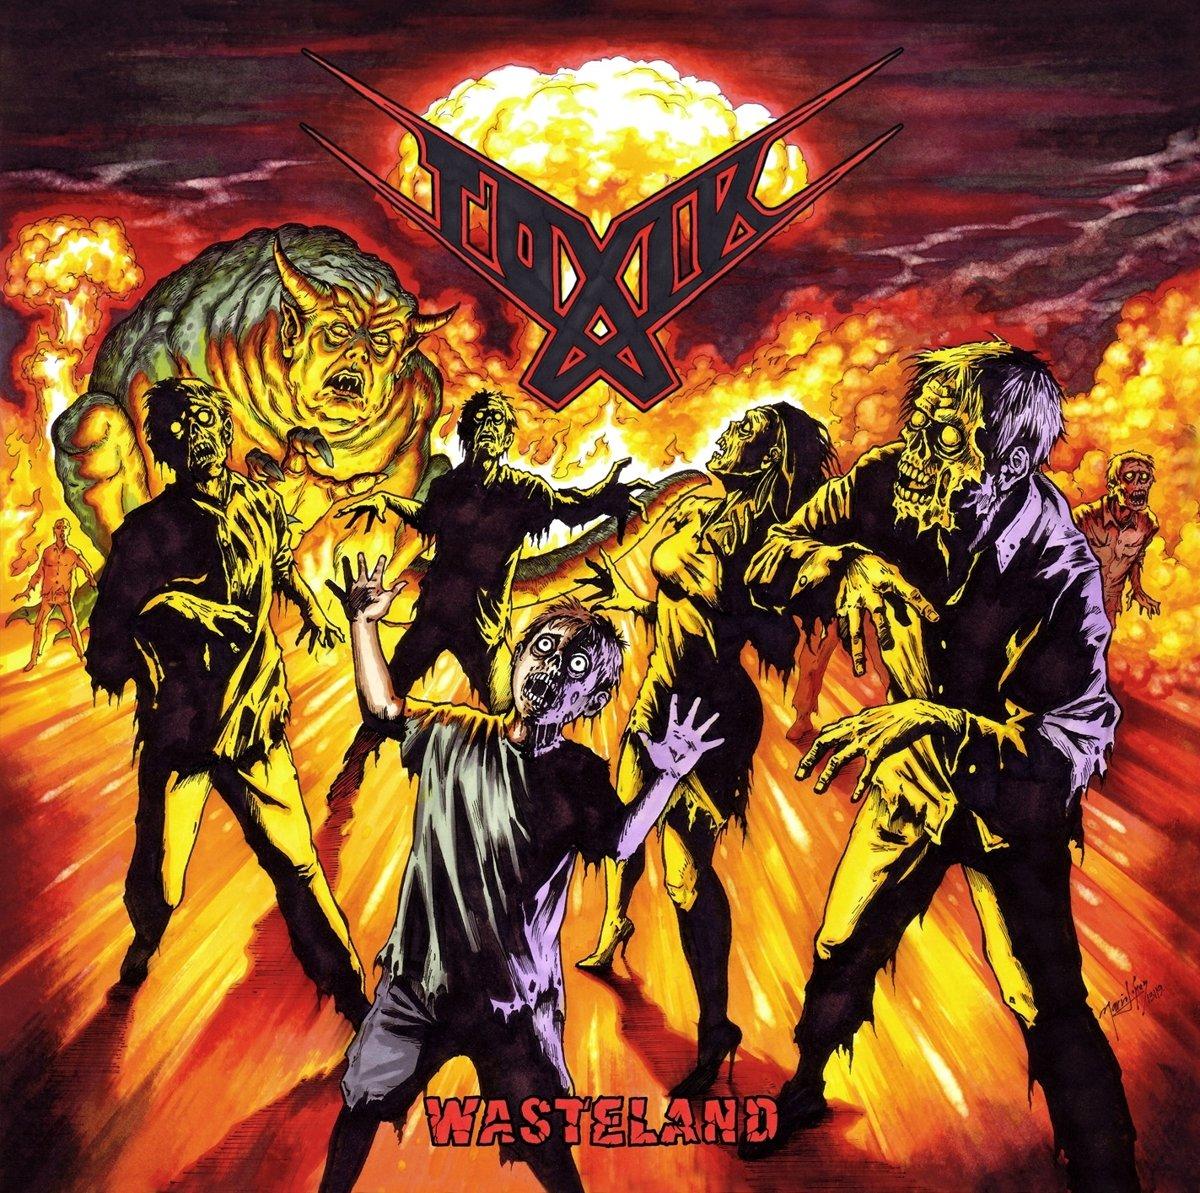 toxik – wasteland [demo / re-release]